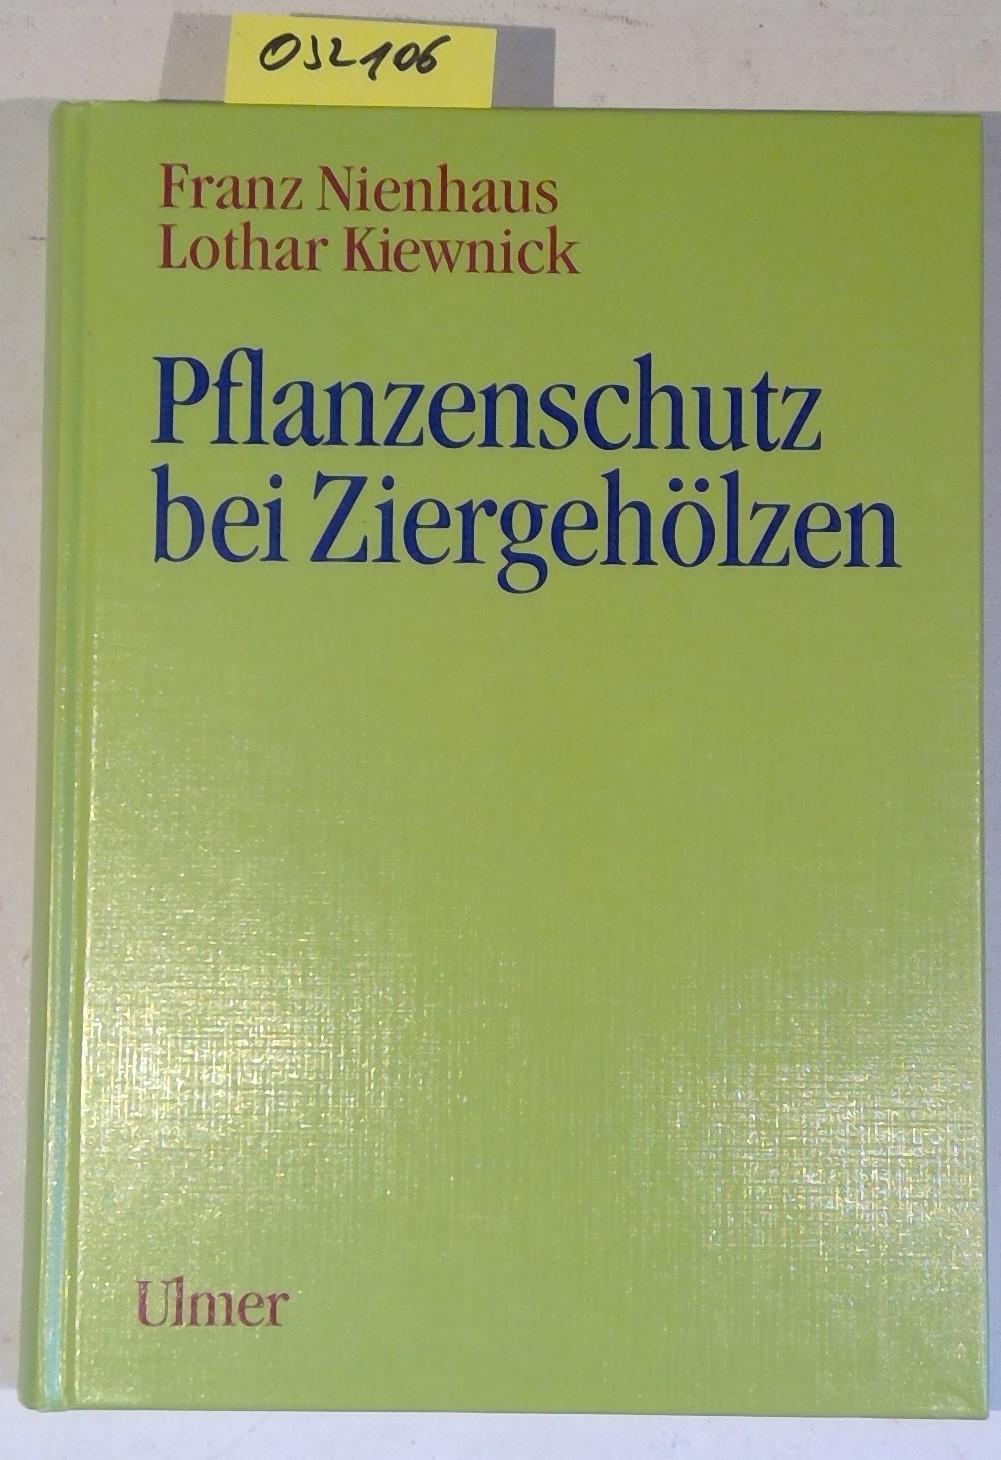 Pflanzenschutz bei Ziergehölzen - Nienhaus, Franz; Kiewnick, Lothar